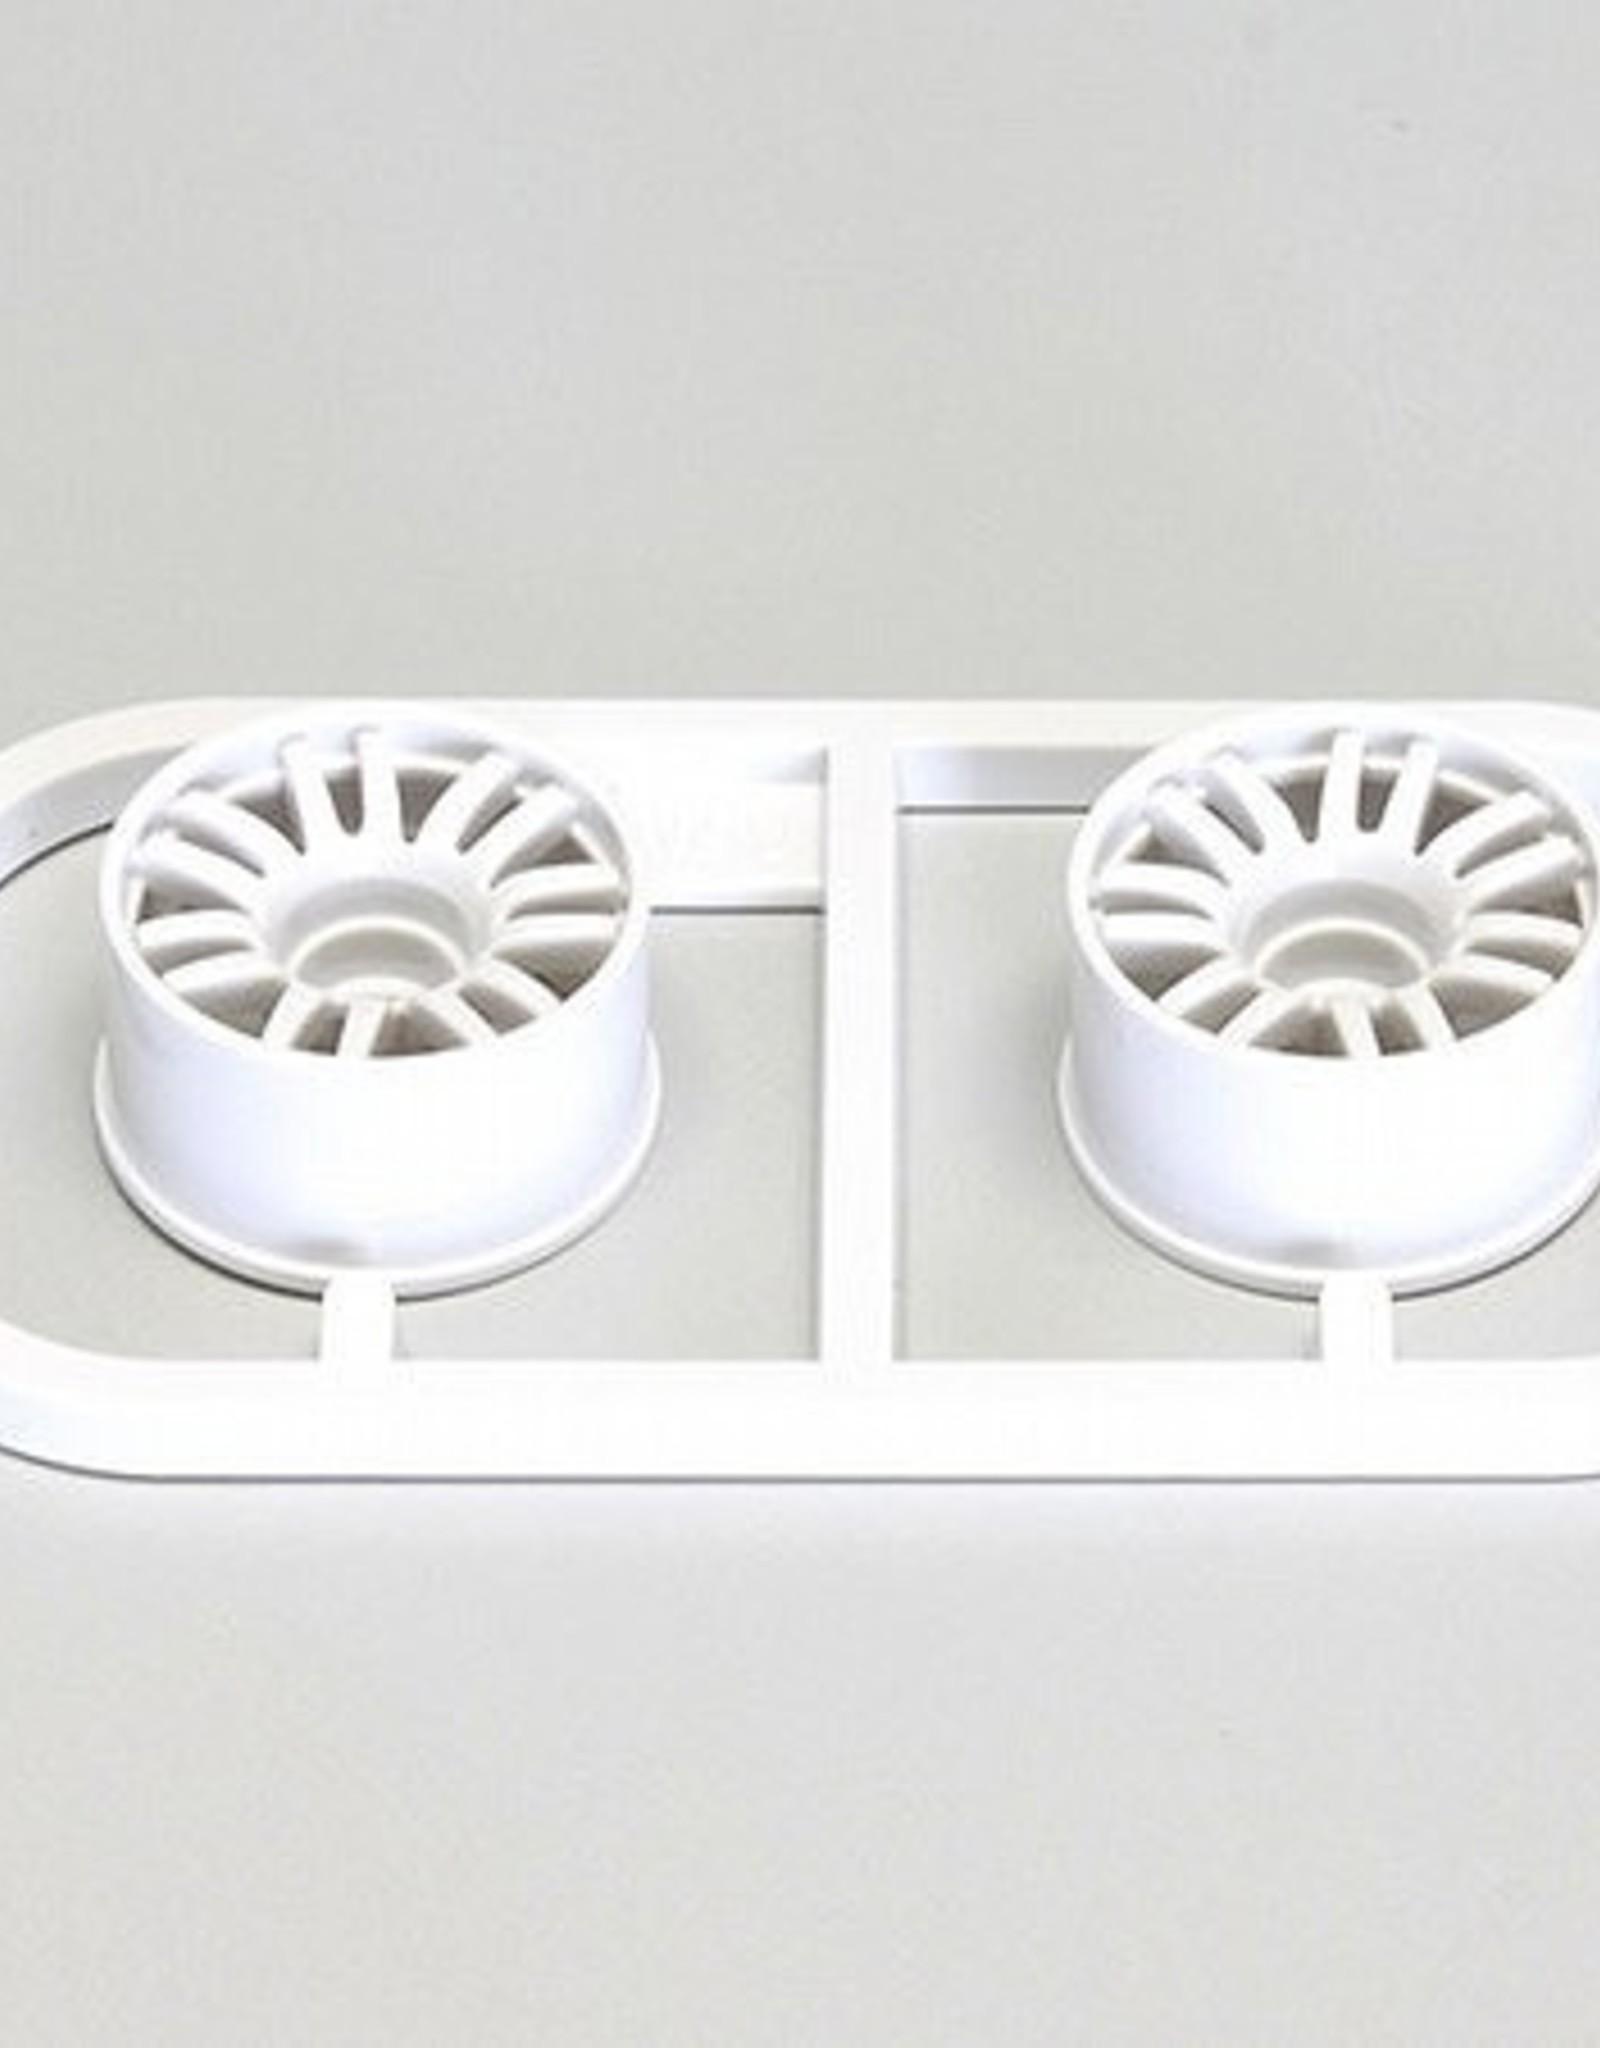 Kyosho Kyosho Multi Wheel II W/Offset 0mm (White/RE30/2pcs)